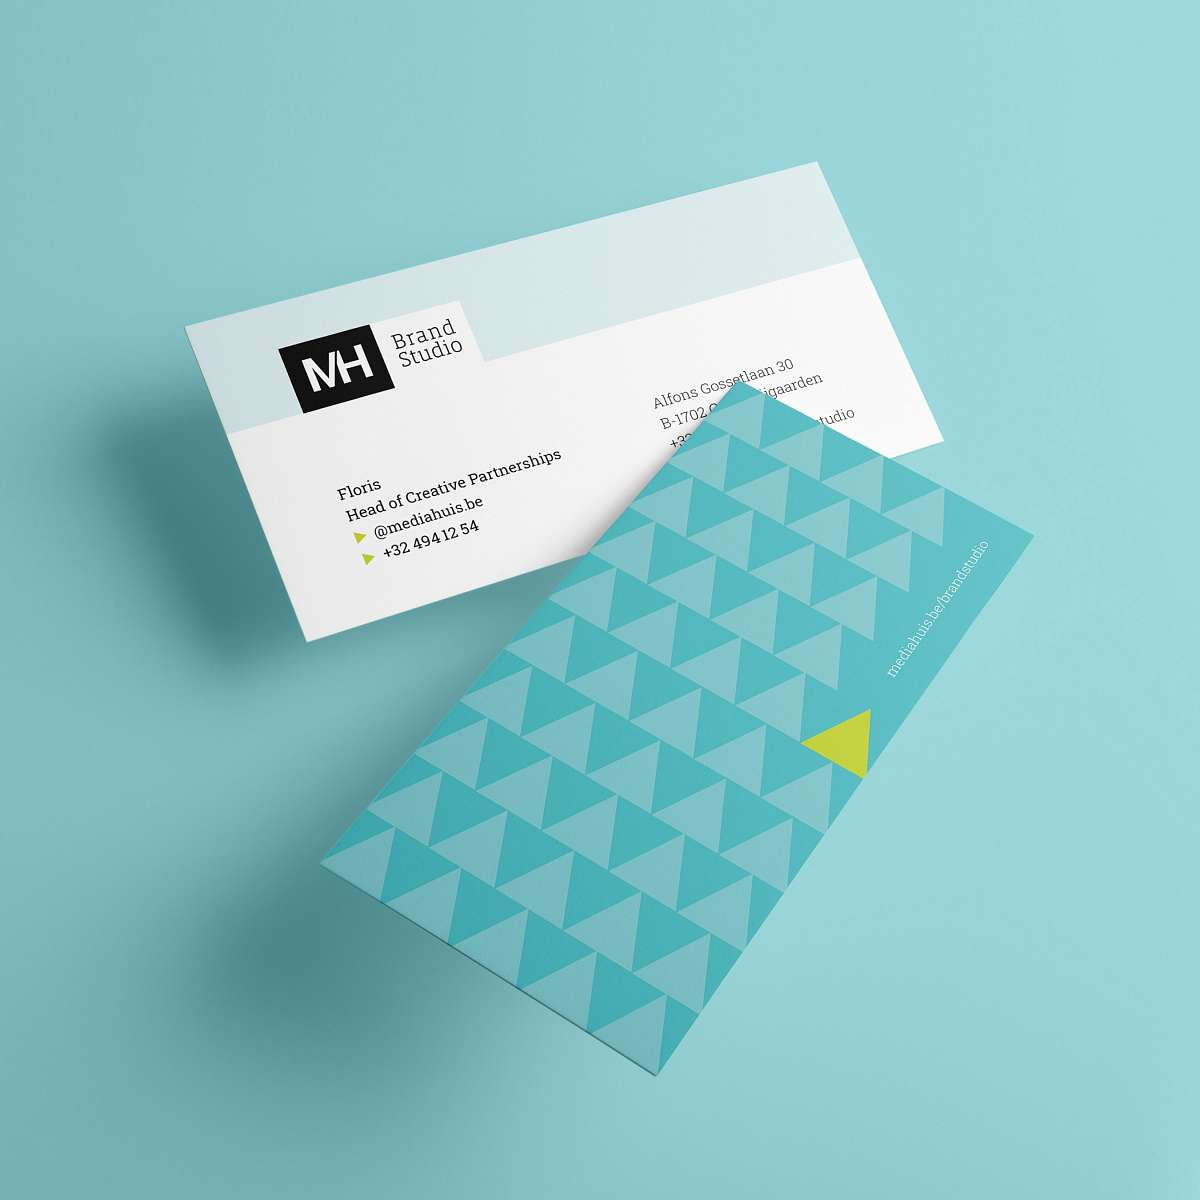 MH Brand Studio